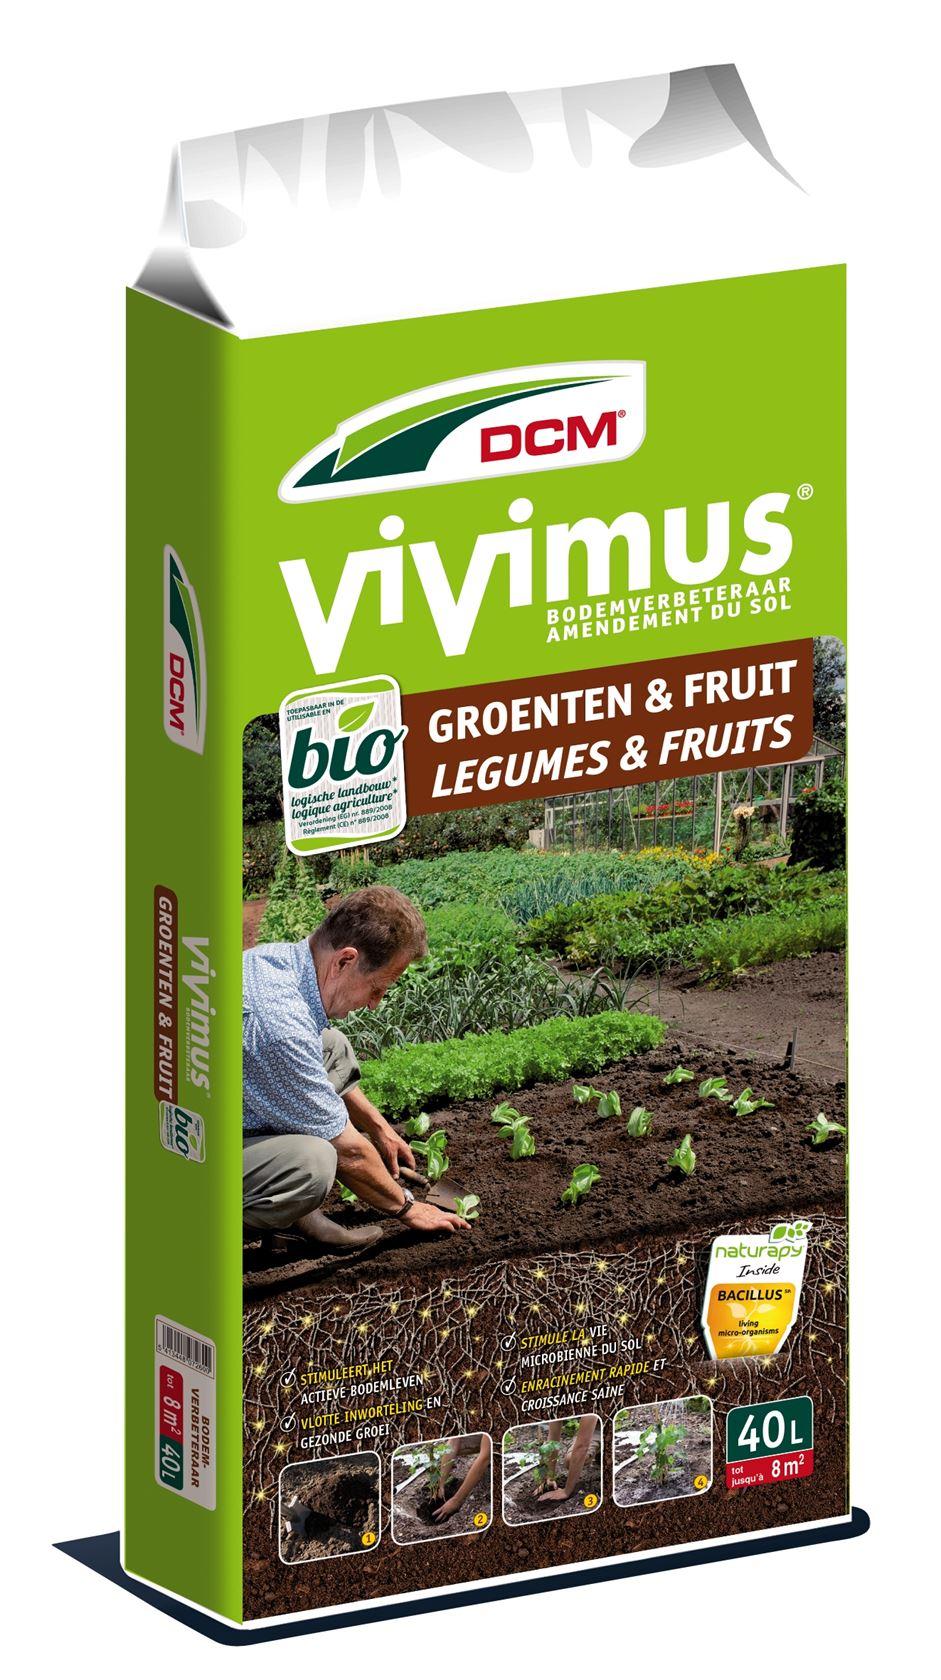 Vivimus bodemverbeteraar groenten & fruit 40L - Bio